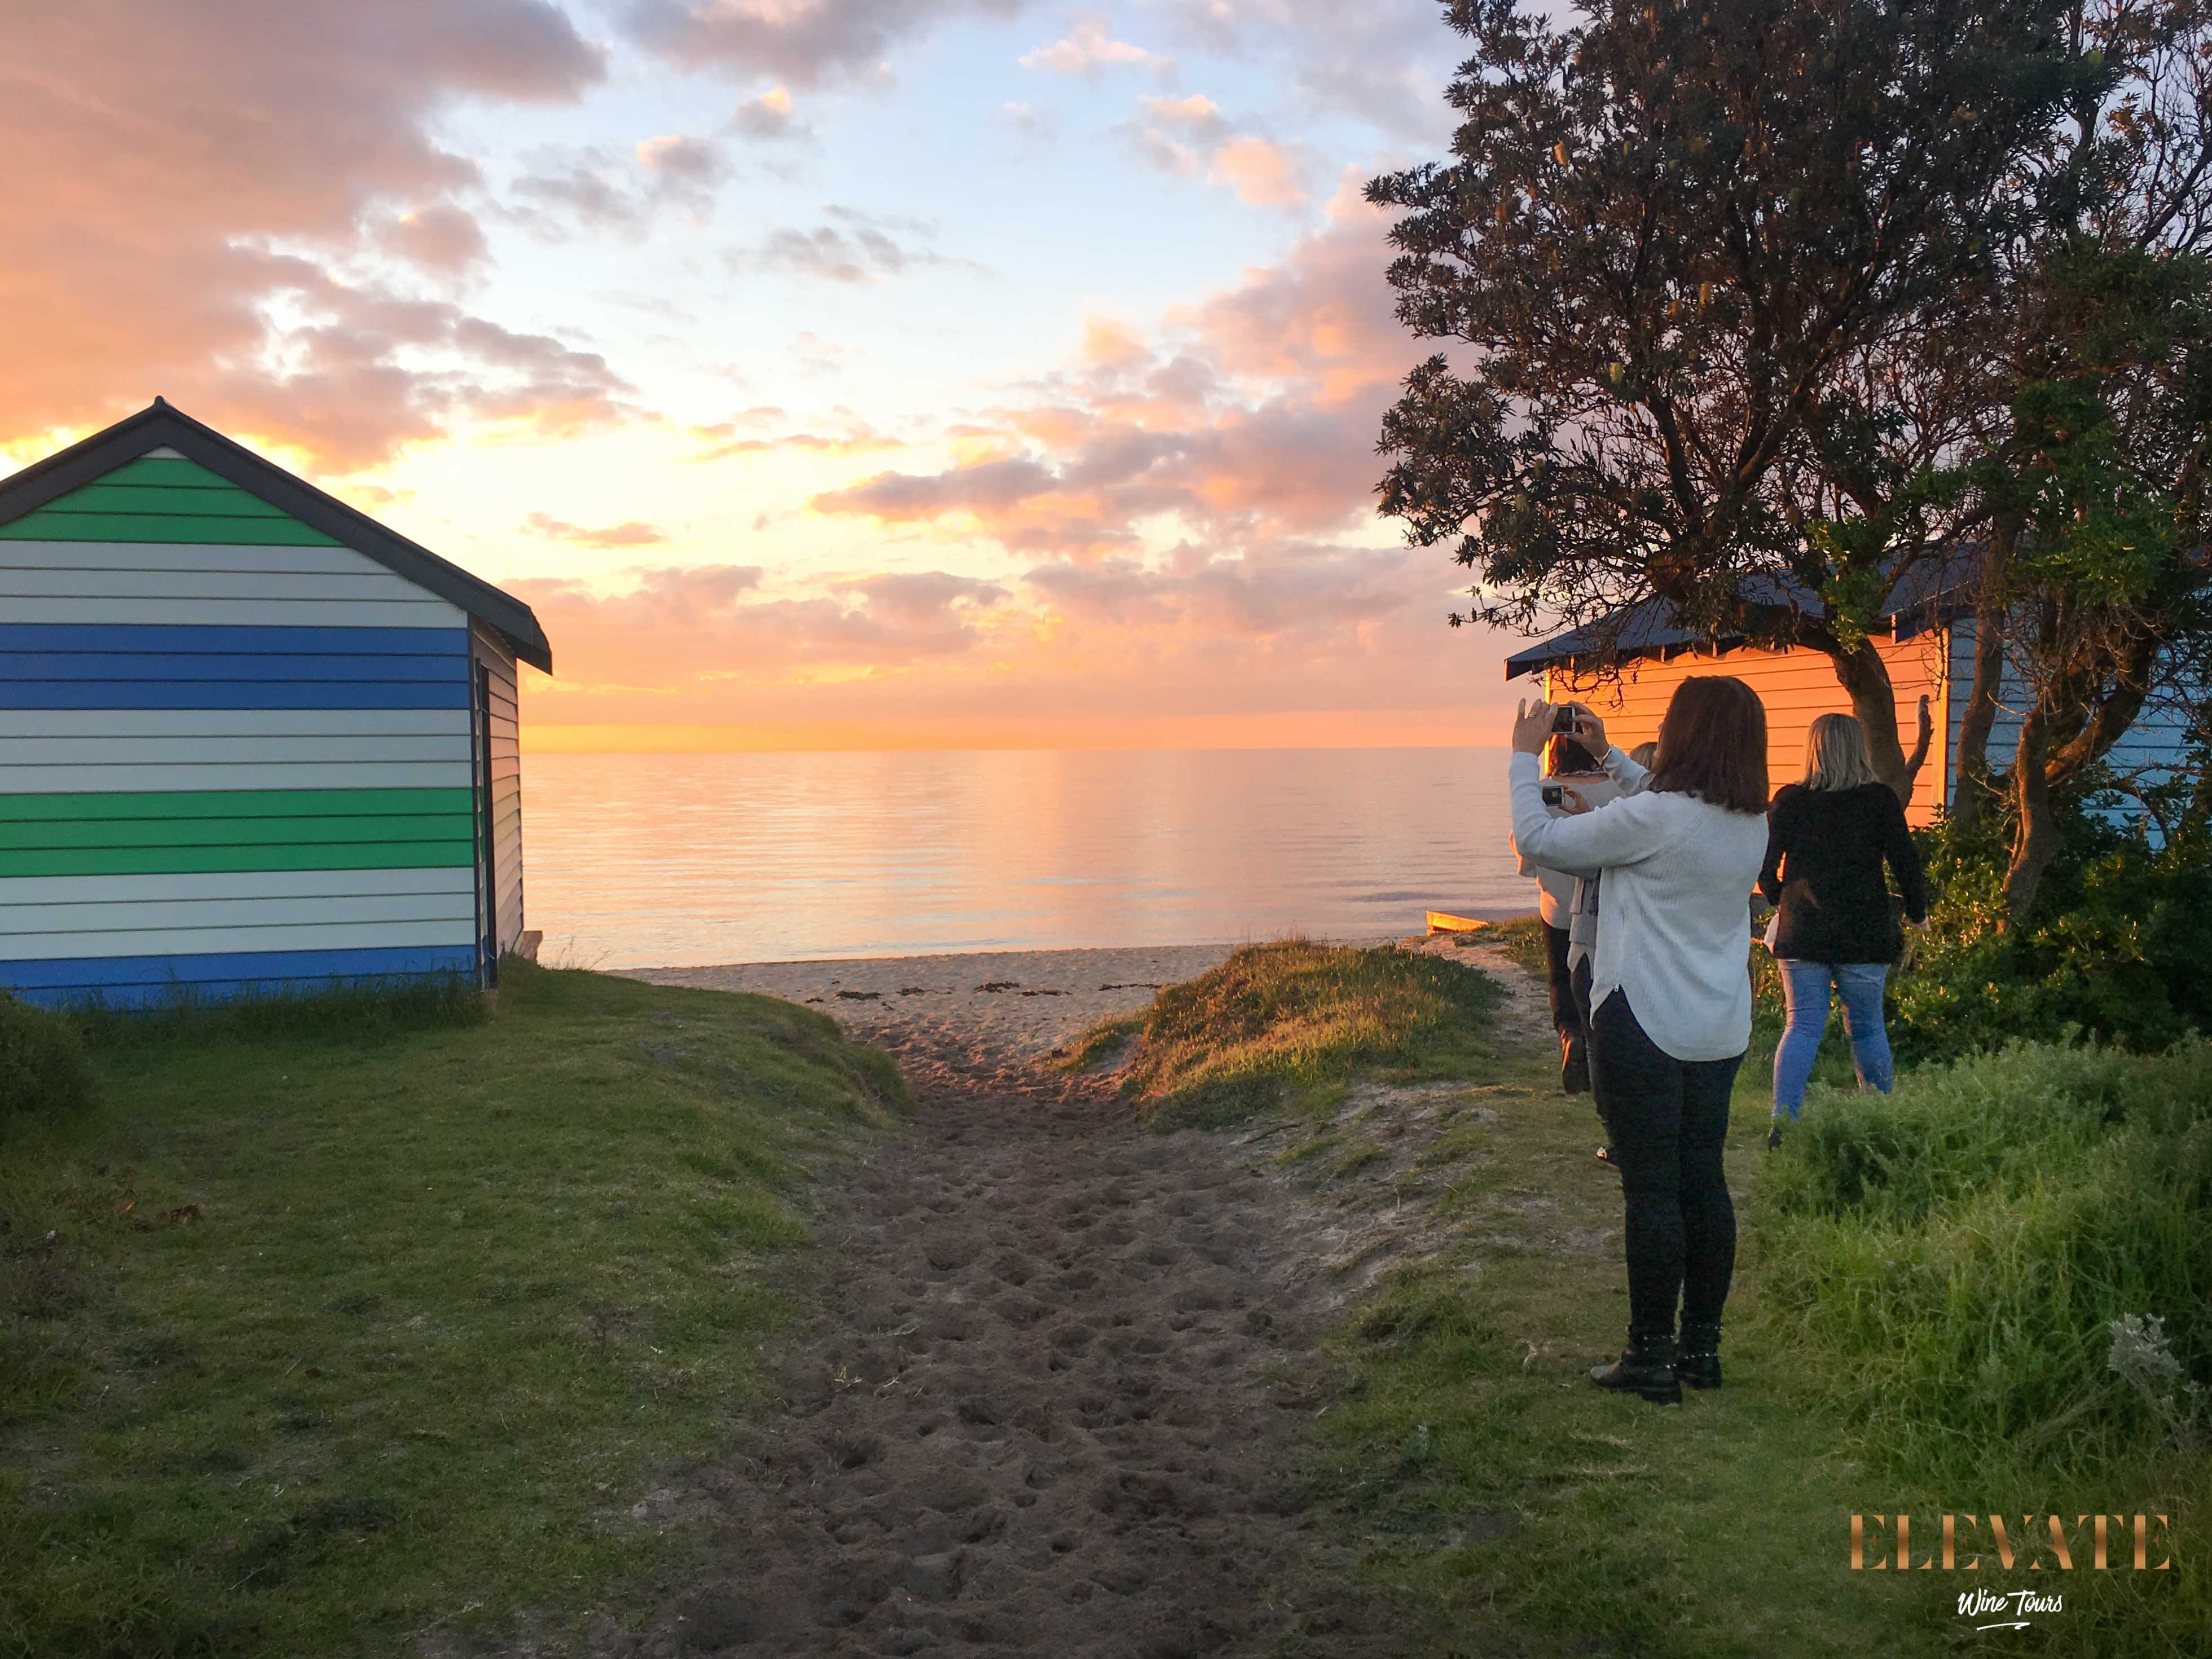 DROMANA-FORESHORE-SUNSET-WINERY-TOUR-BEACH-HUT